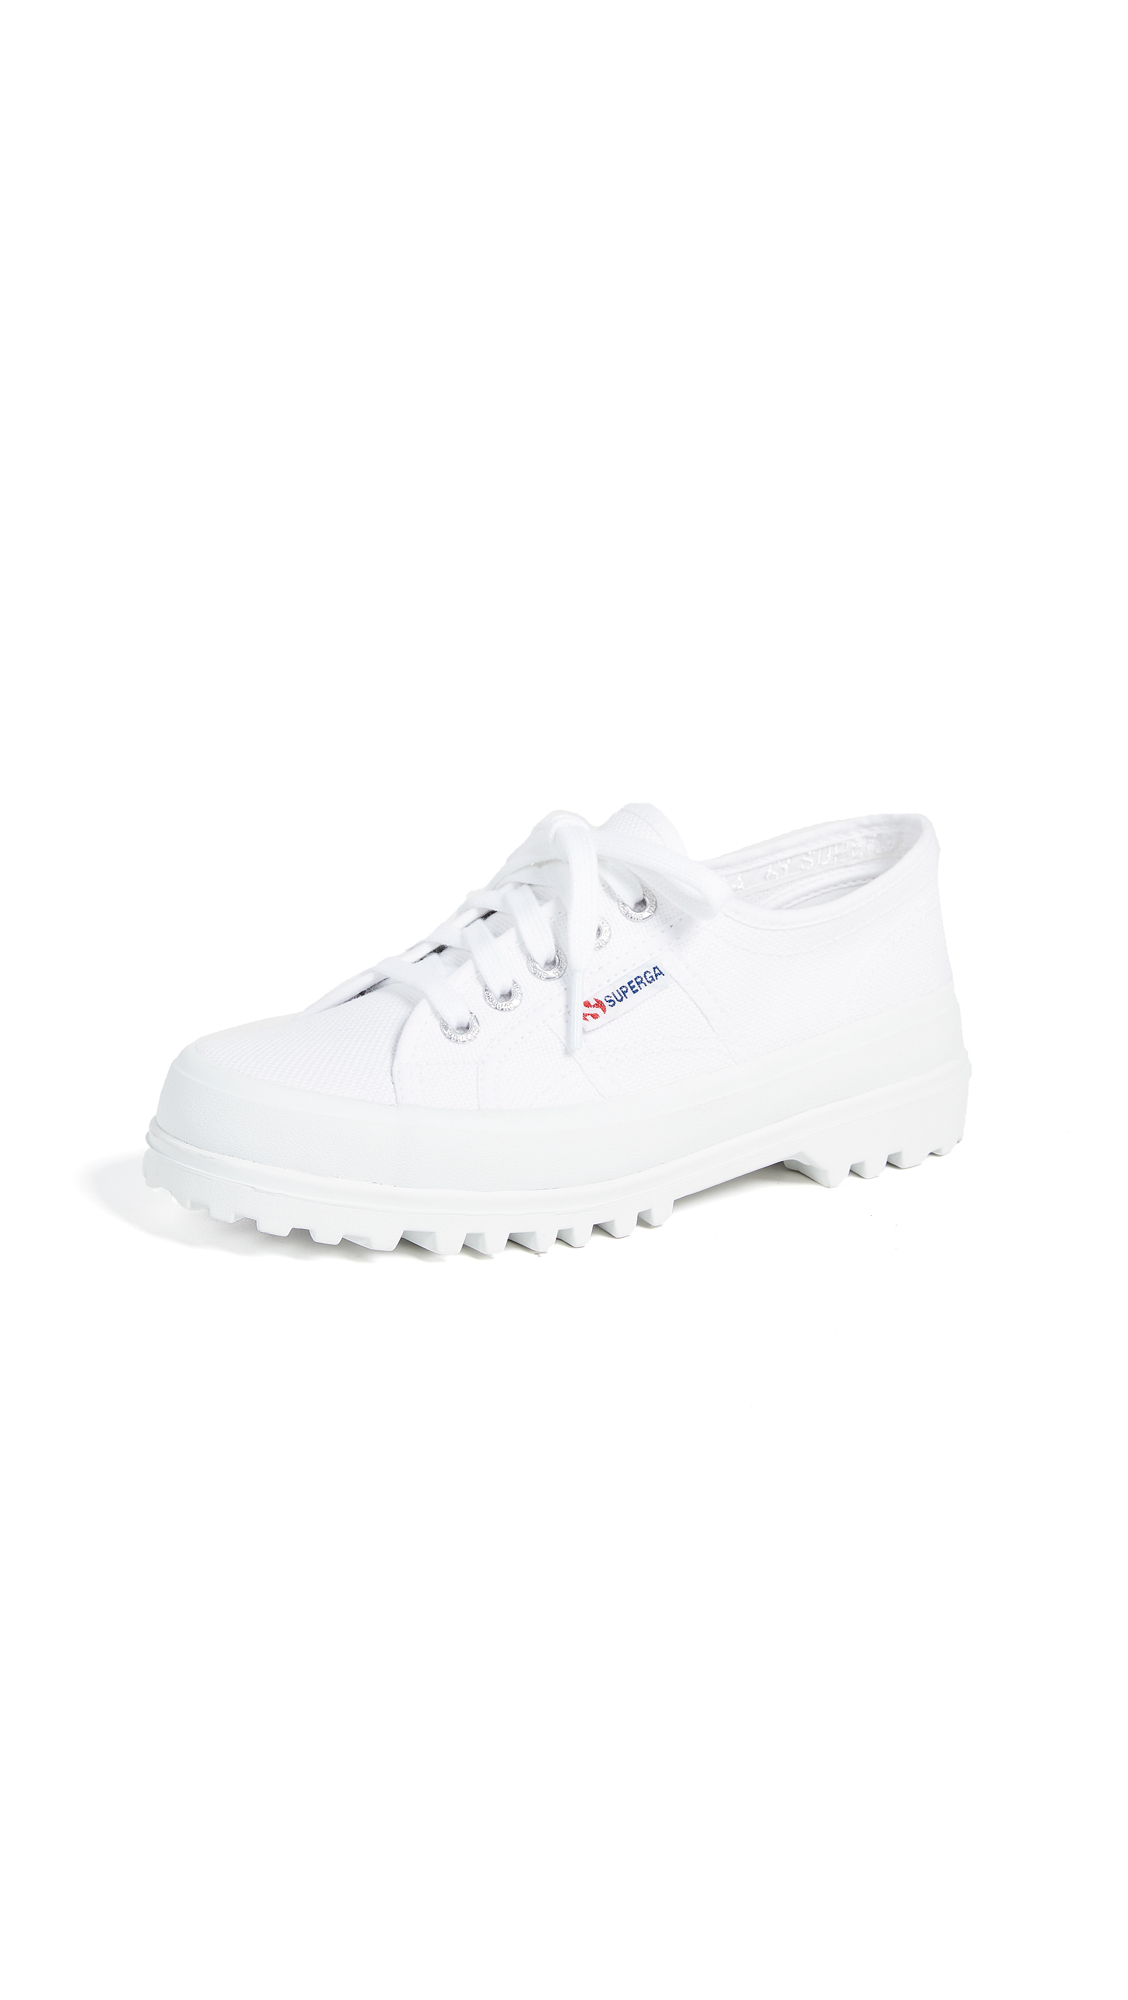 Superga 2555 Cotu Lug Sole Sneakers - White